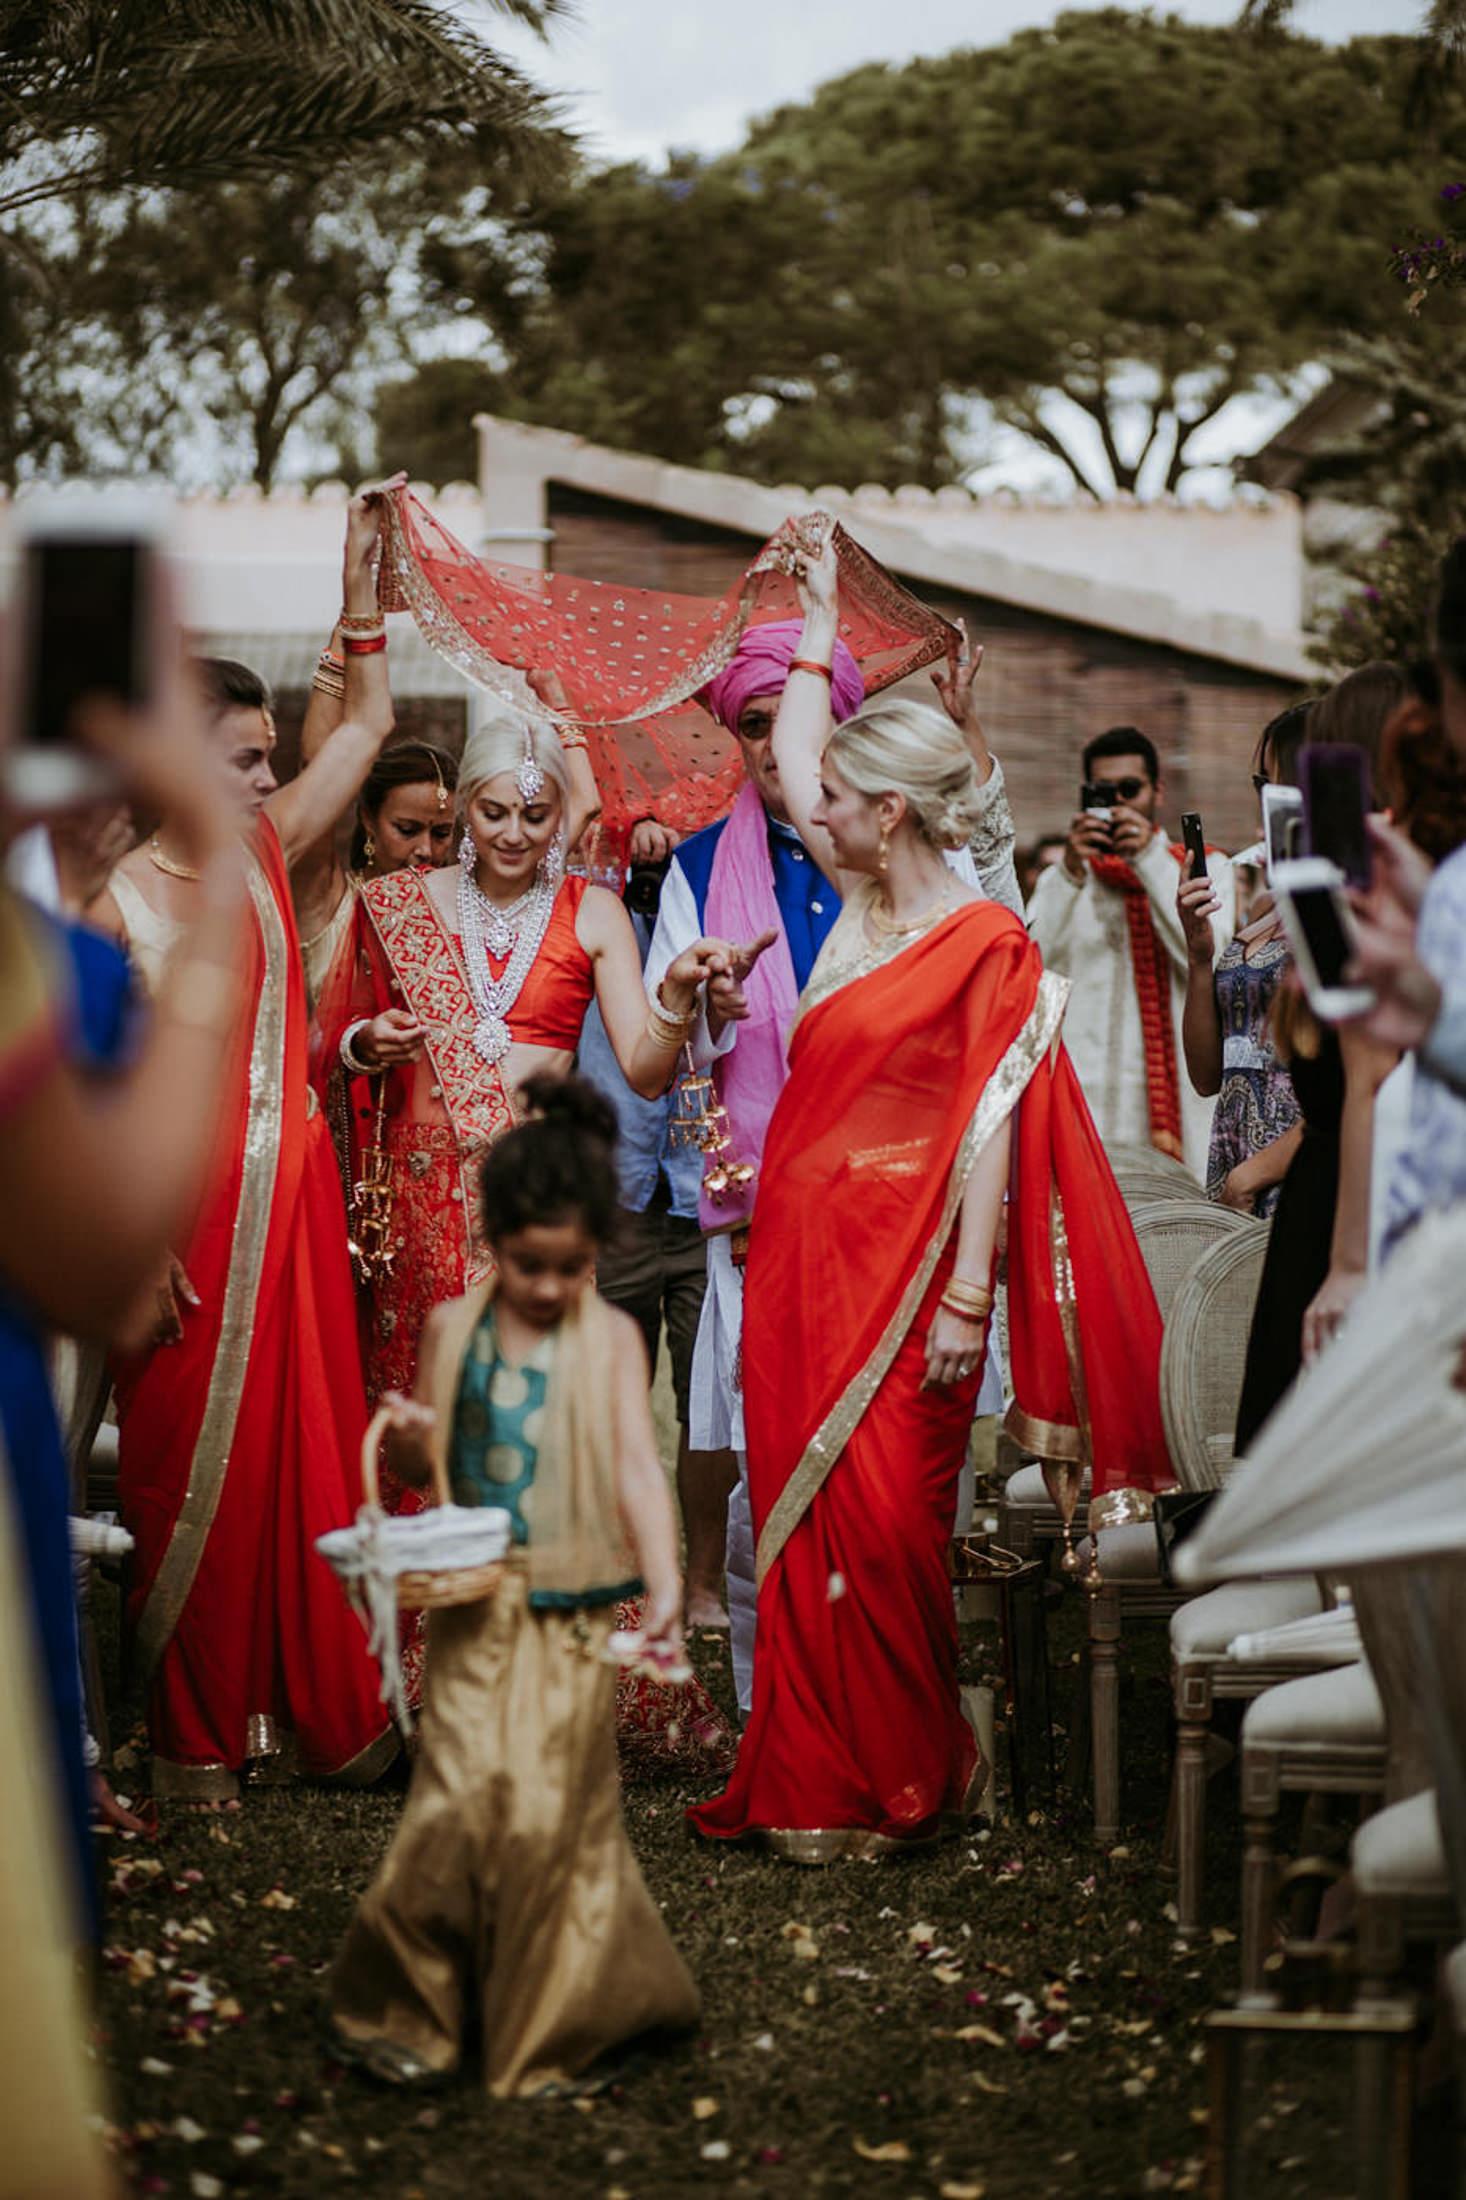 Wedding_Photographer_Mallorca_Daniela-Marquardt_Photography_New_York_Iceland_Tuscany_Santorini_Portugal_Austria_Bavaria_Elopement_Hochzeitsfotograf_AntjeRajat2_44